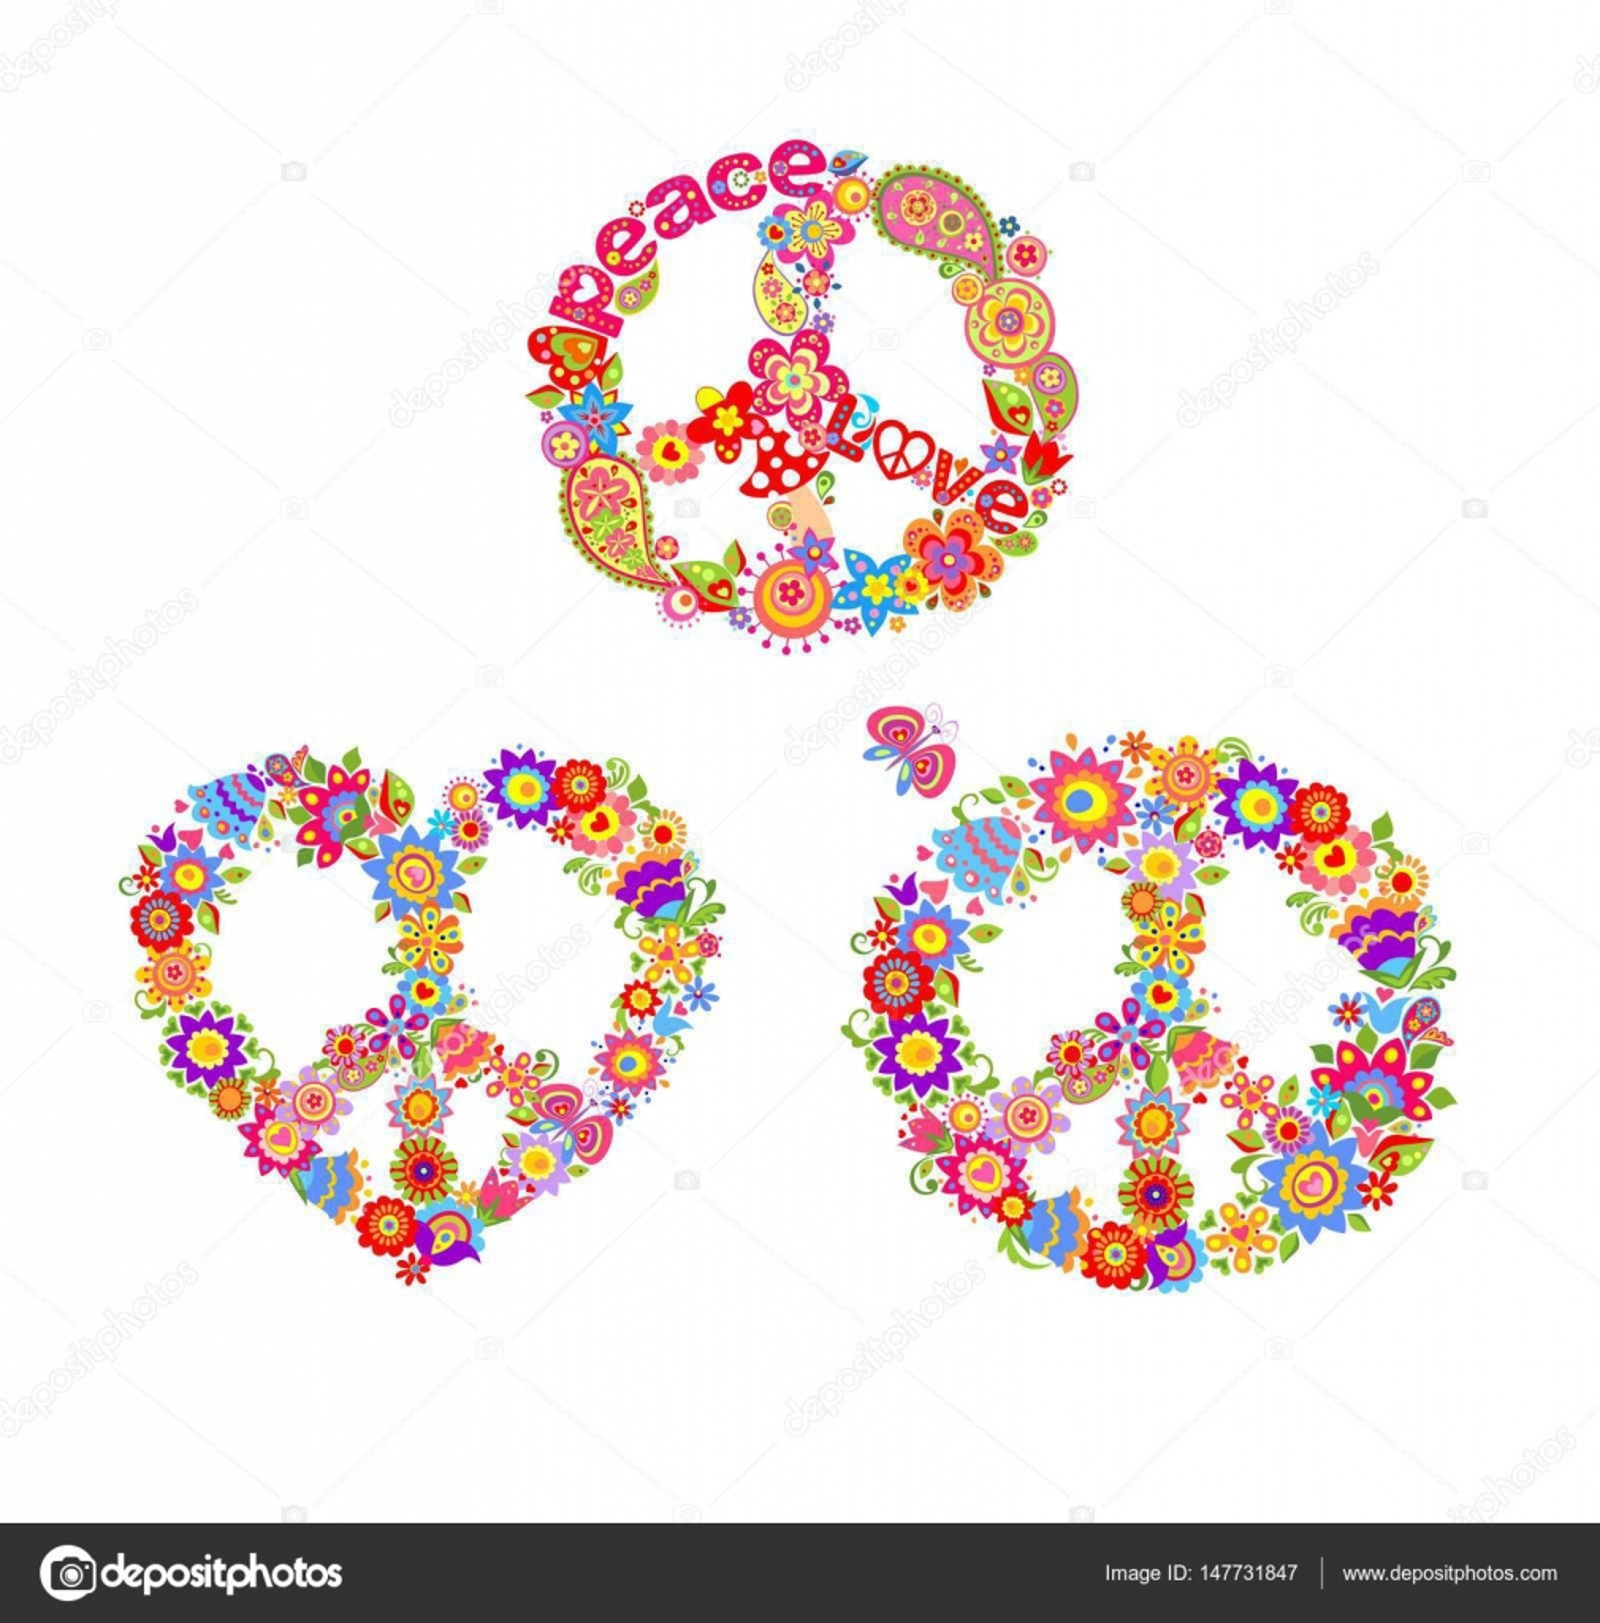 Decorative hippie prints with peace flower symbols stock vector decorative hippie prints with peace flower symbols stock vector biocorpaavc Images